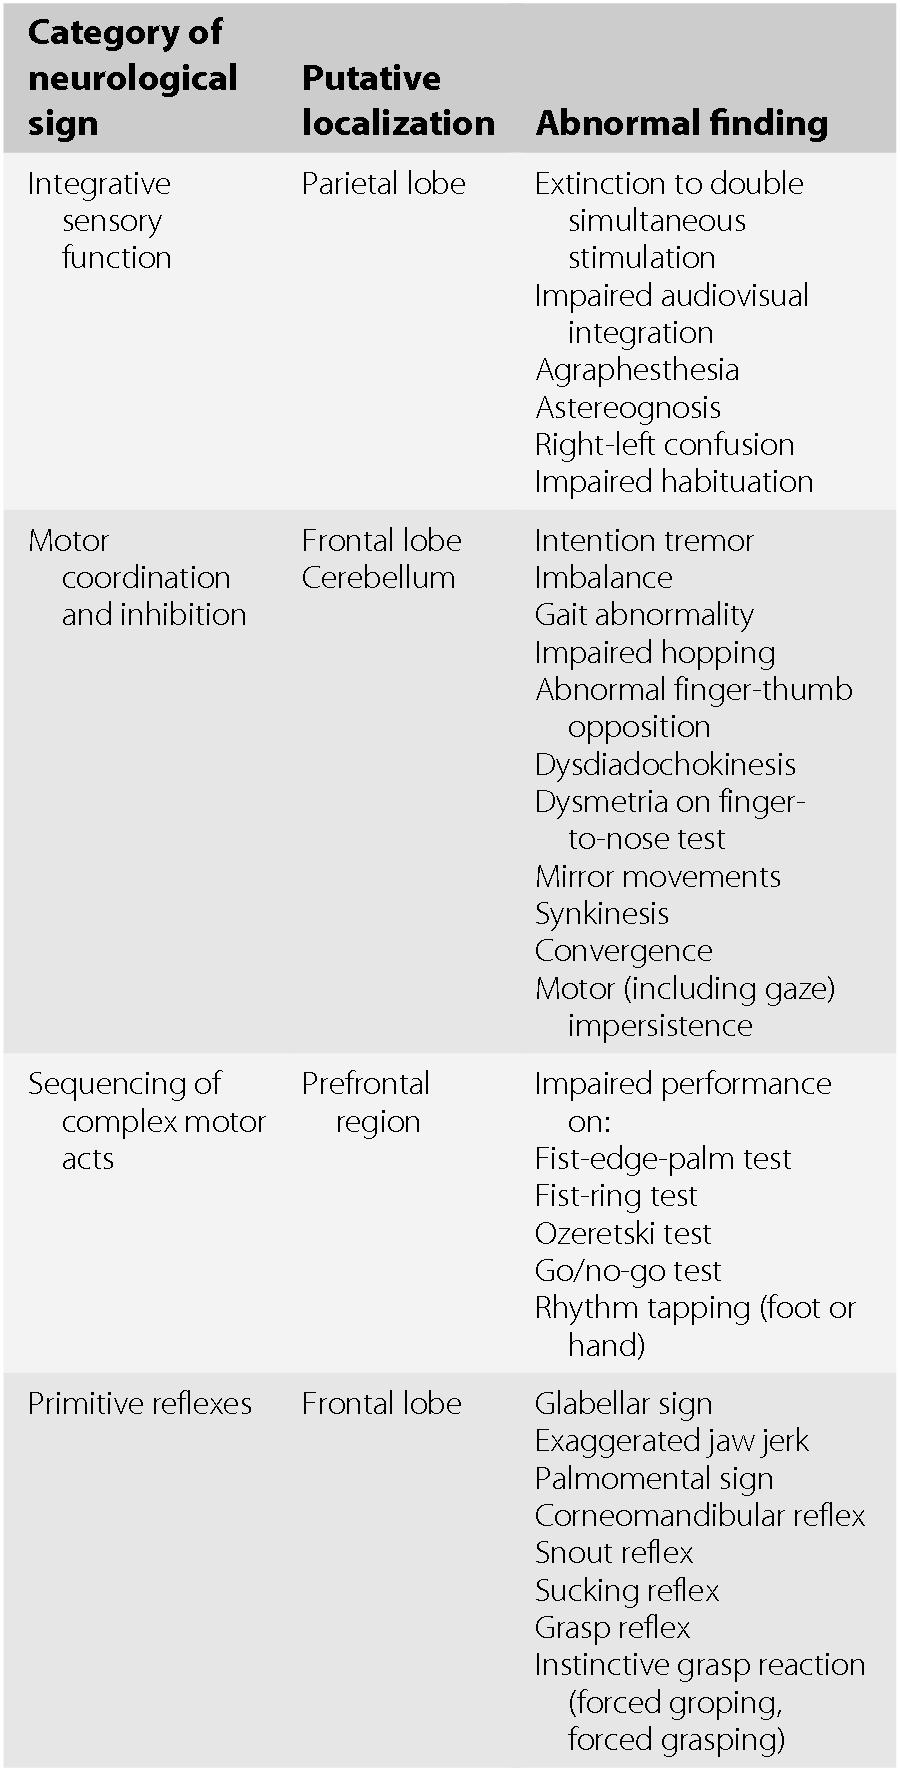 Neurobehavioral and Neuropsychiatric Assessment (Section II